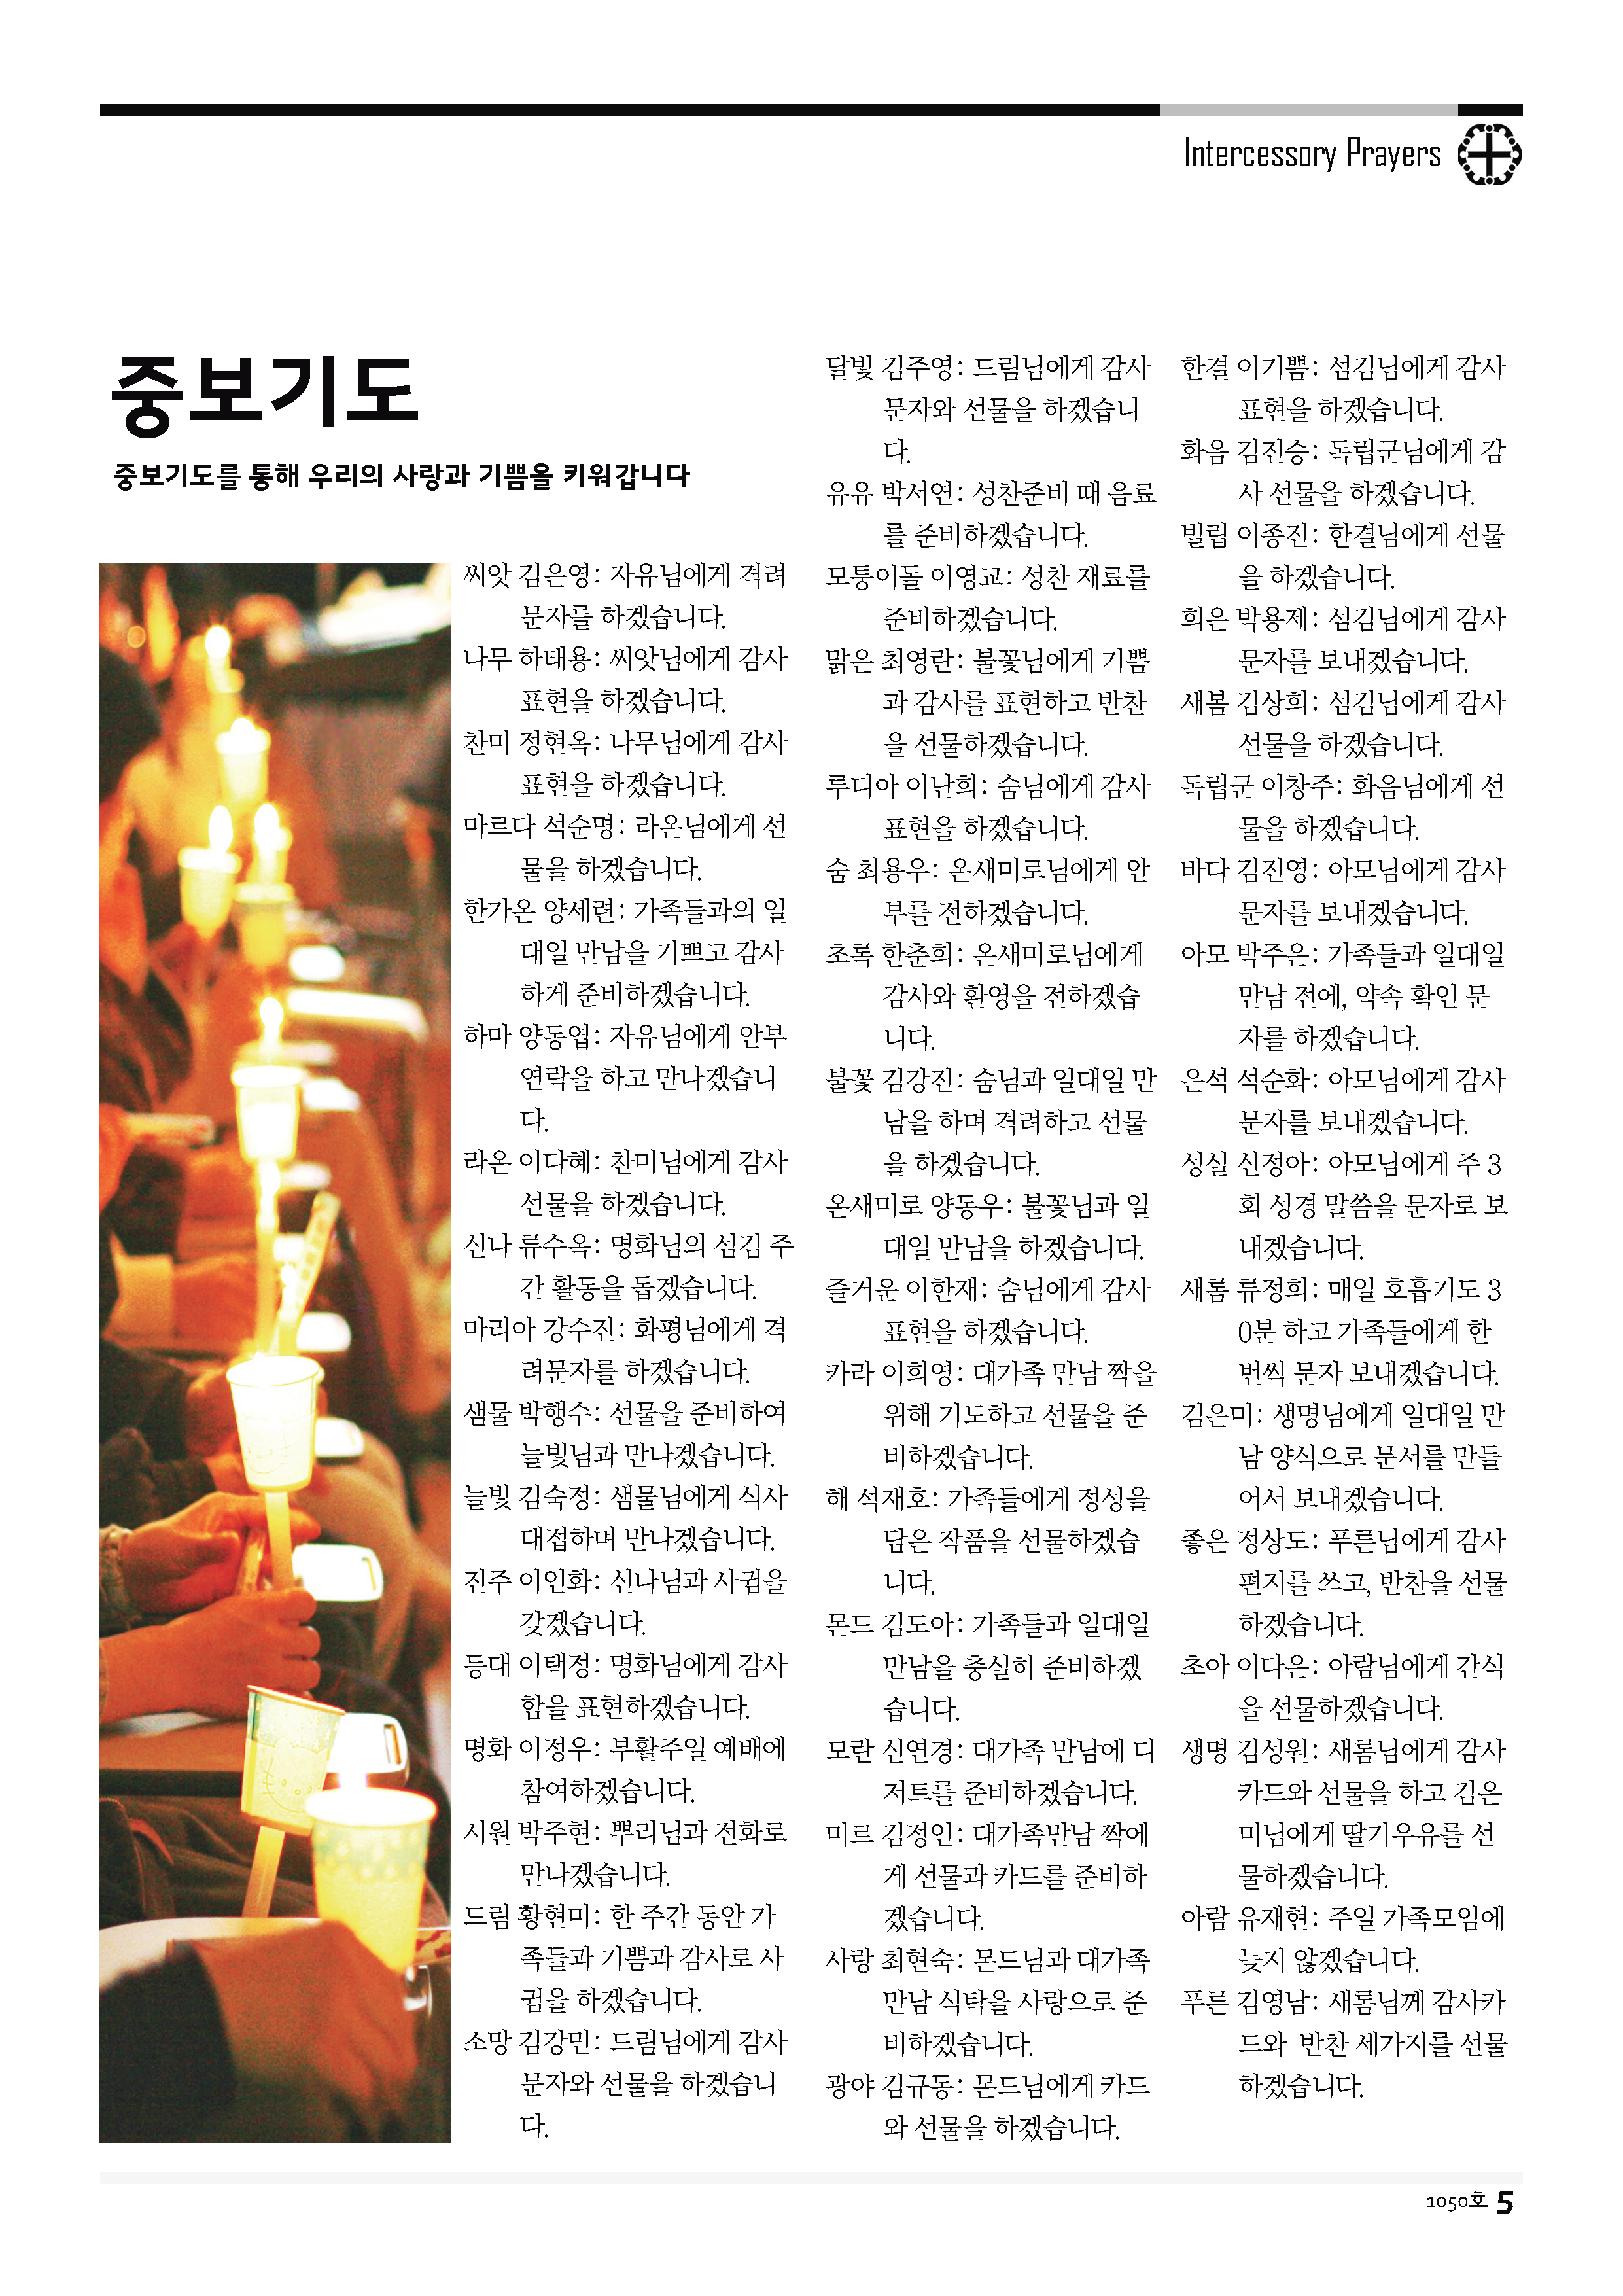 18sdjb0401_페이지_05.png